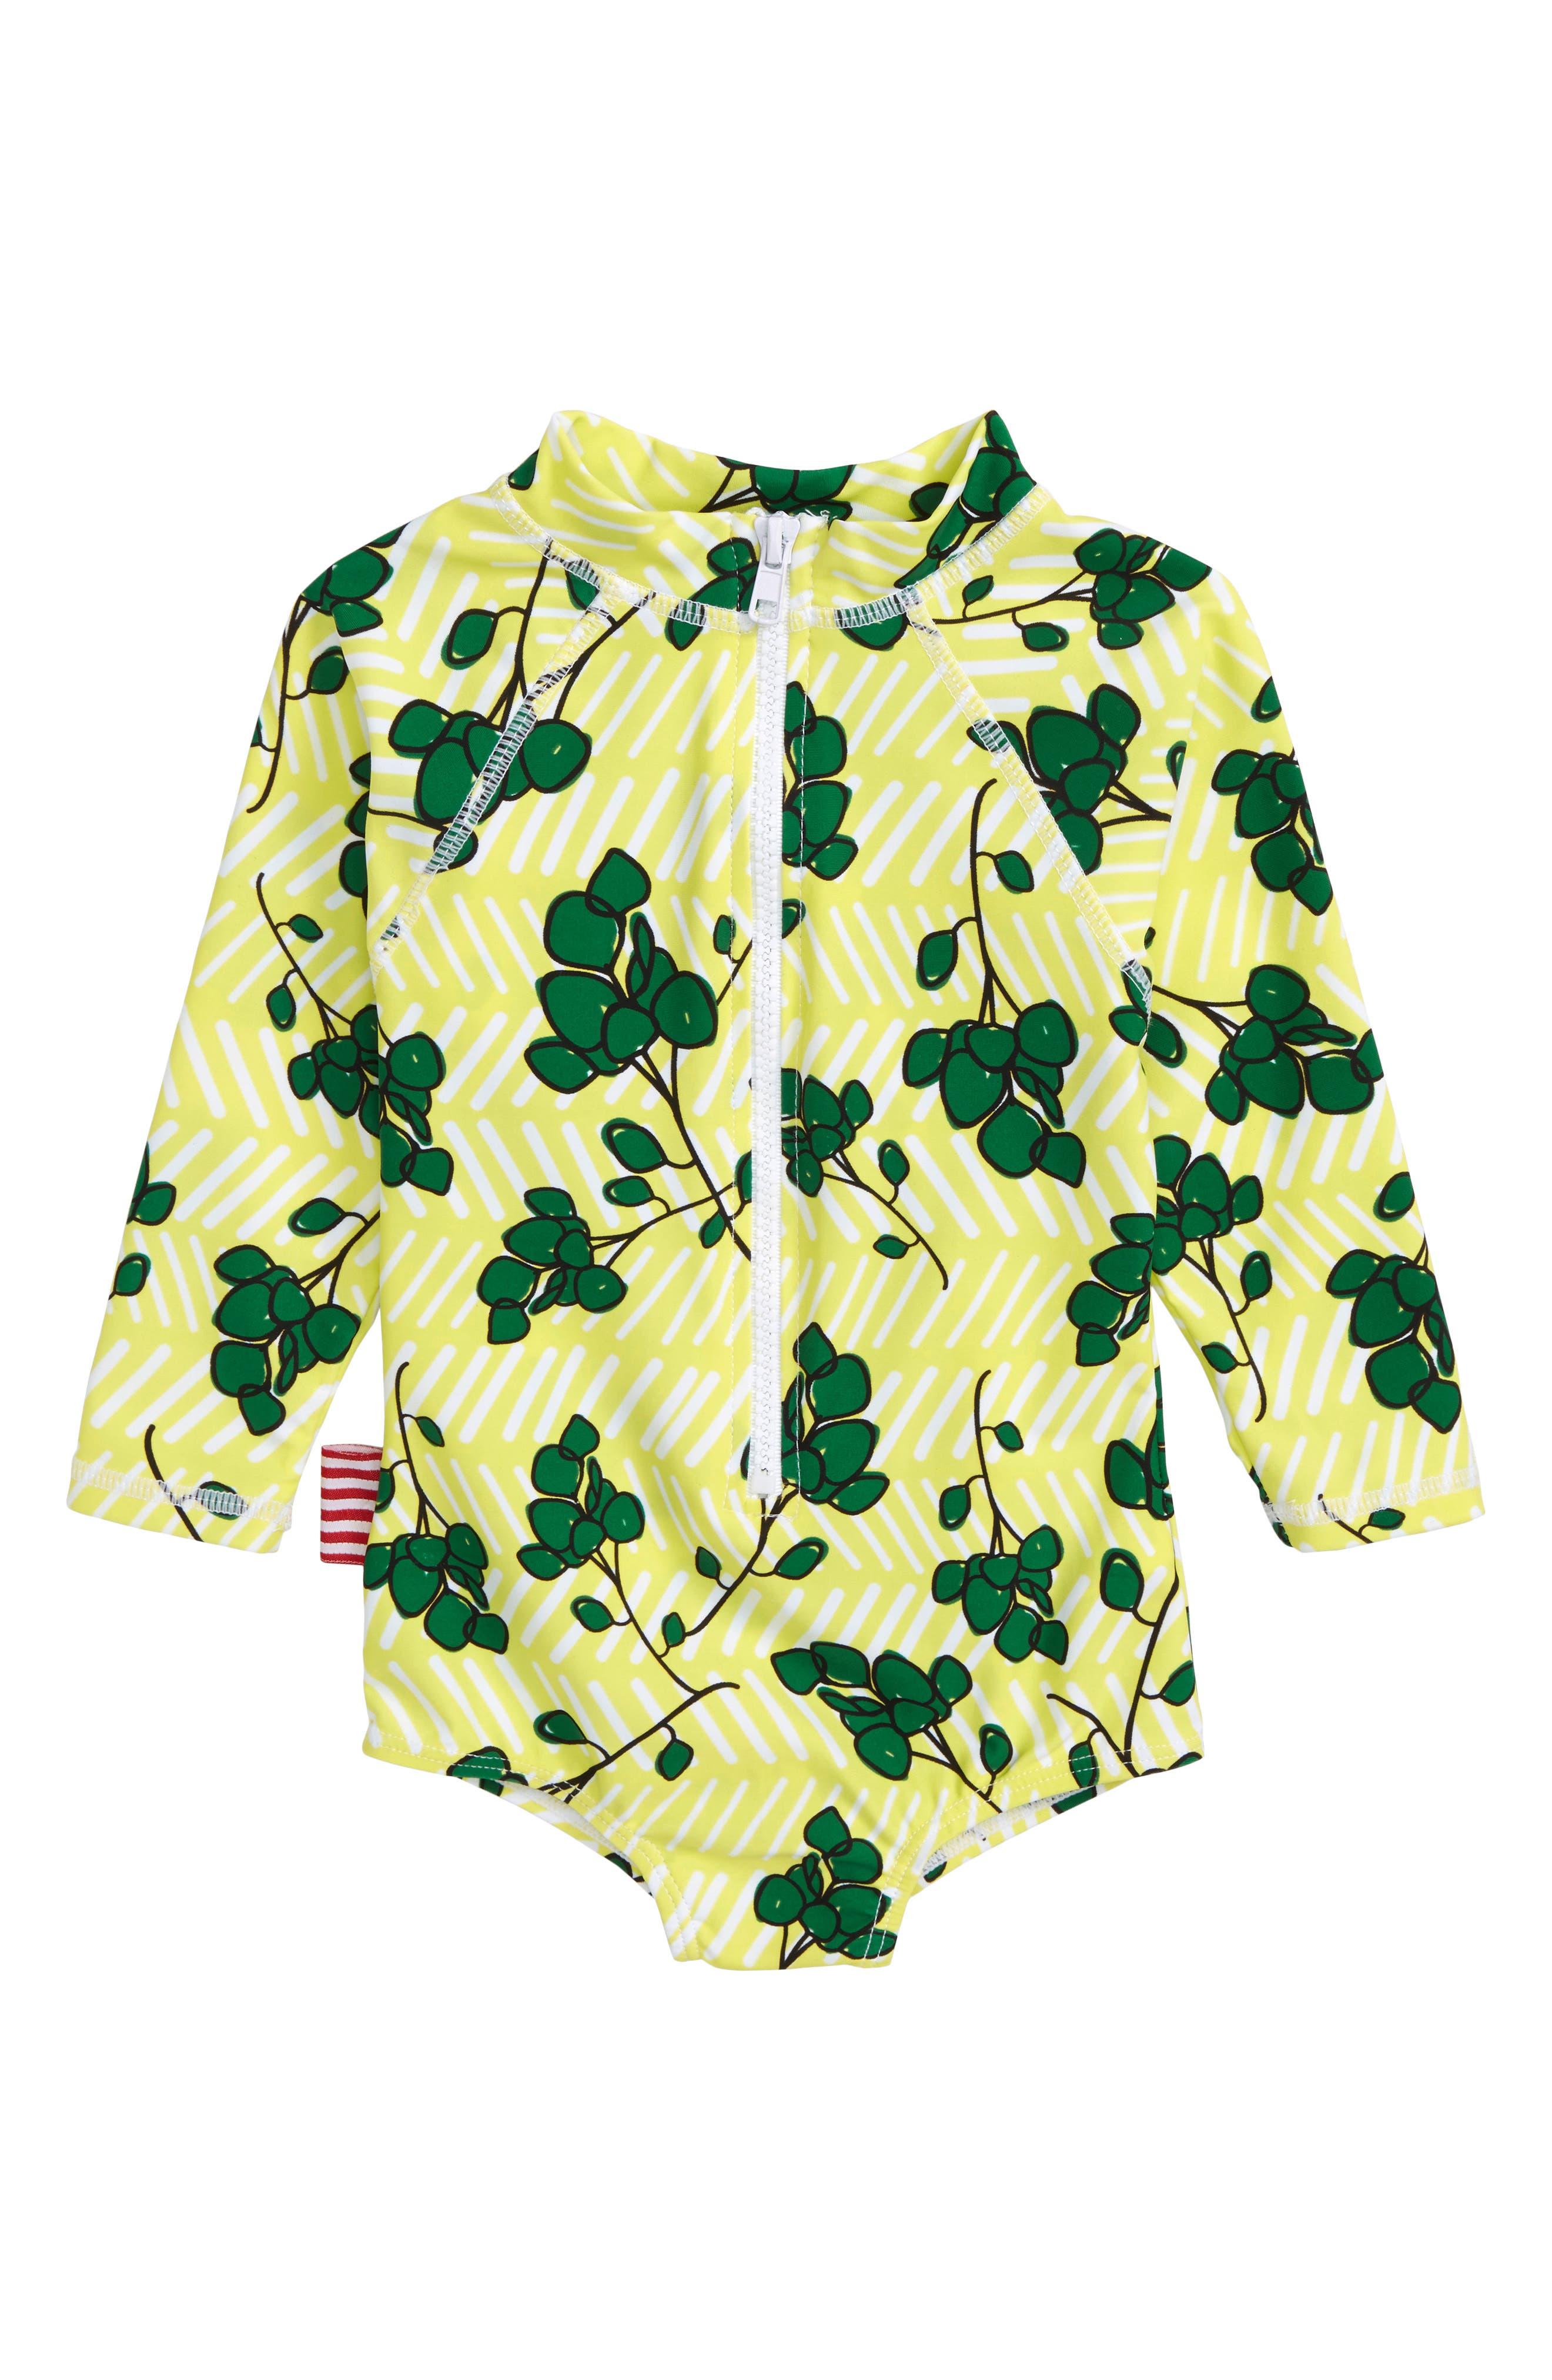 Limun One-Piece Rashguard Swimsuit,                             Main thumbnail 1, color,                             700